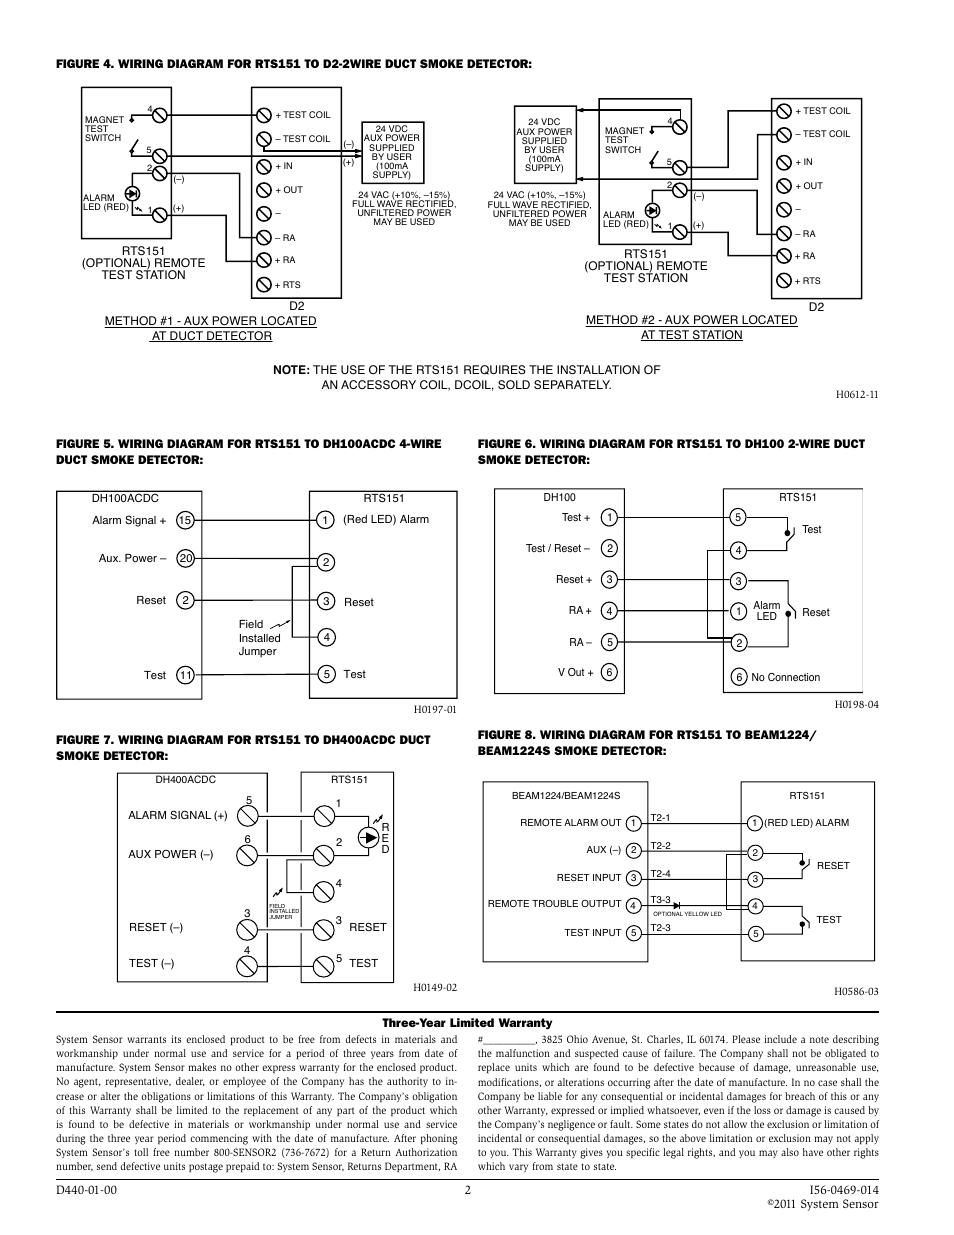 astonishing mahindra max electrical wiring diagrams contemporary rh cashsigns us mahindra 4500 wiring diagram Kubota Tractor Wiring Diagrams